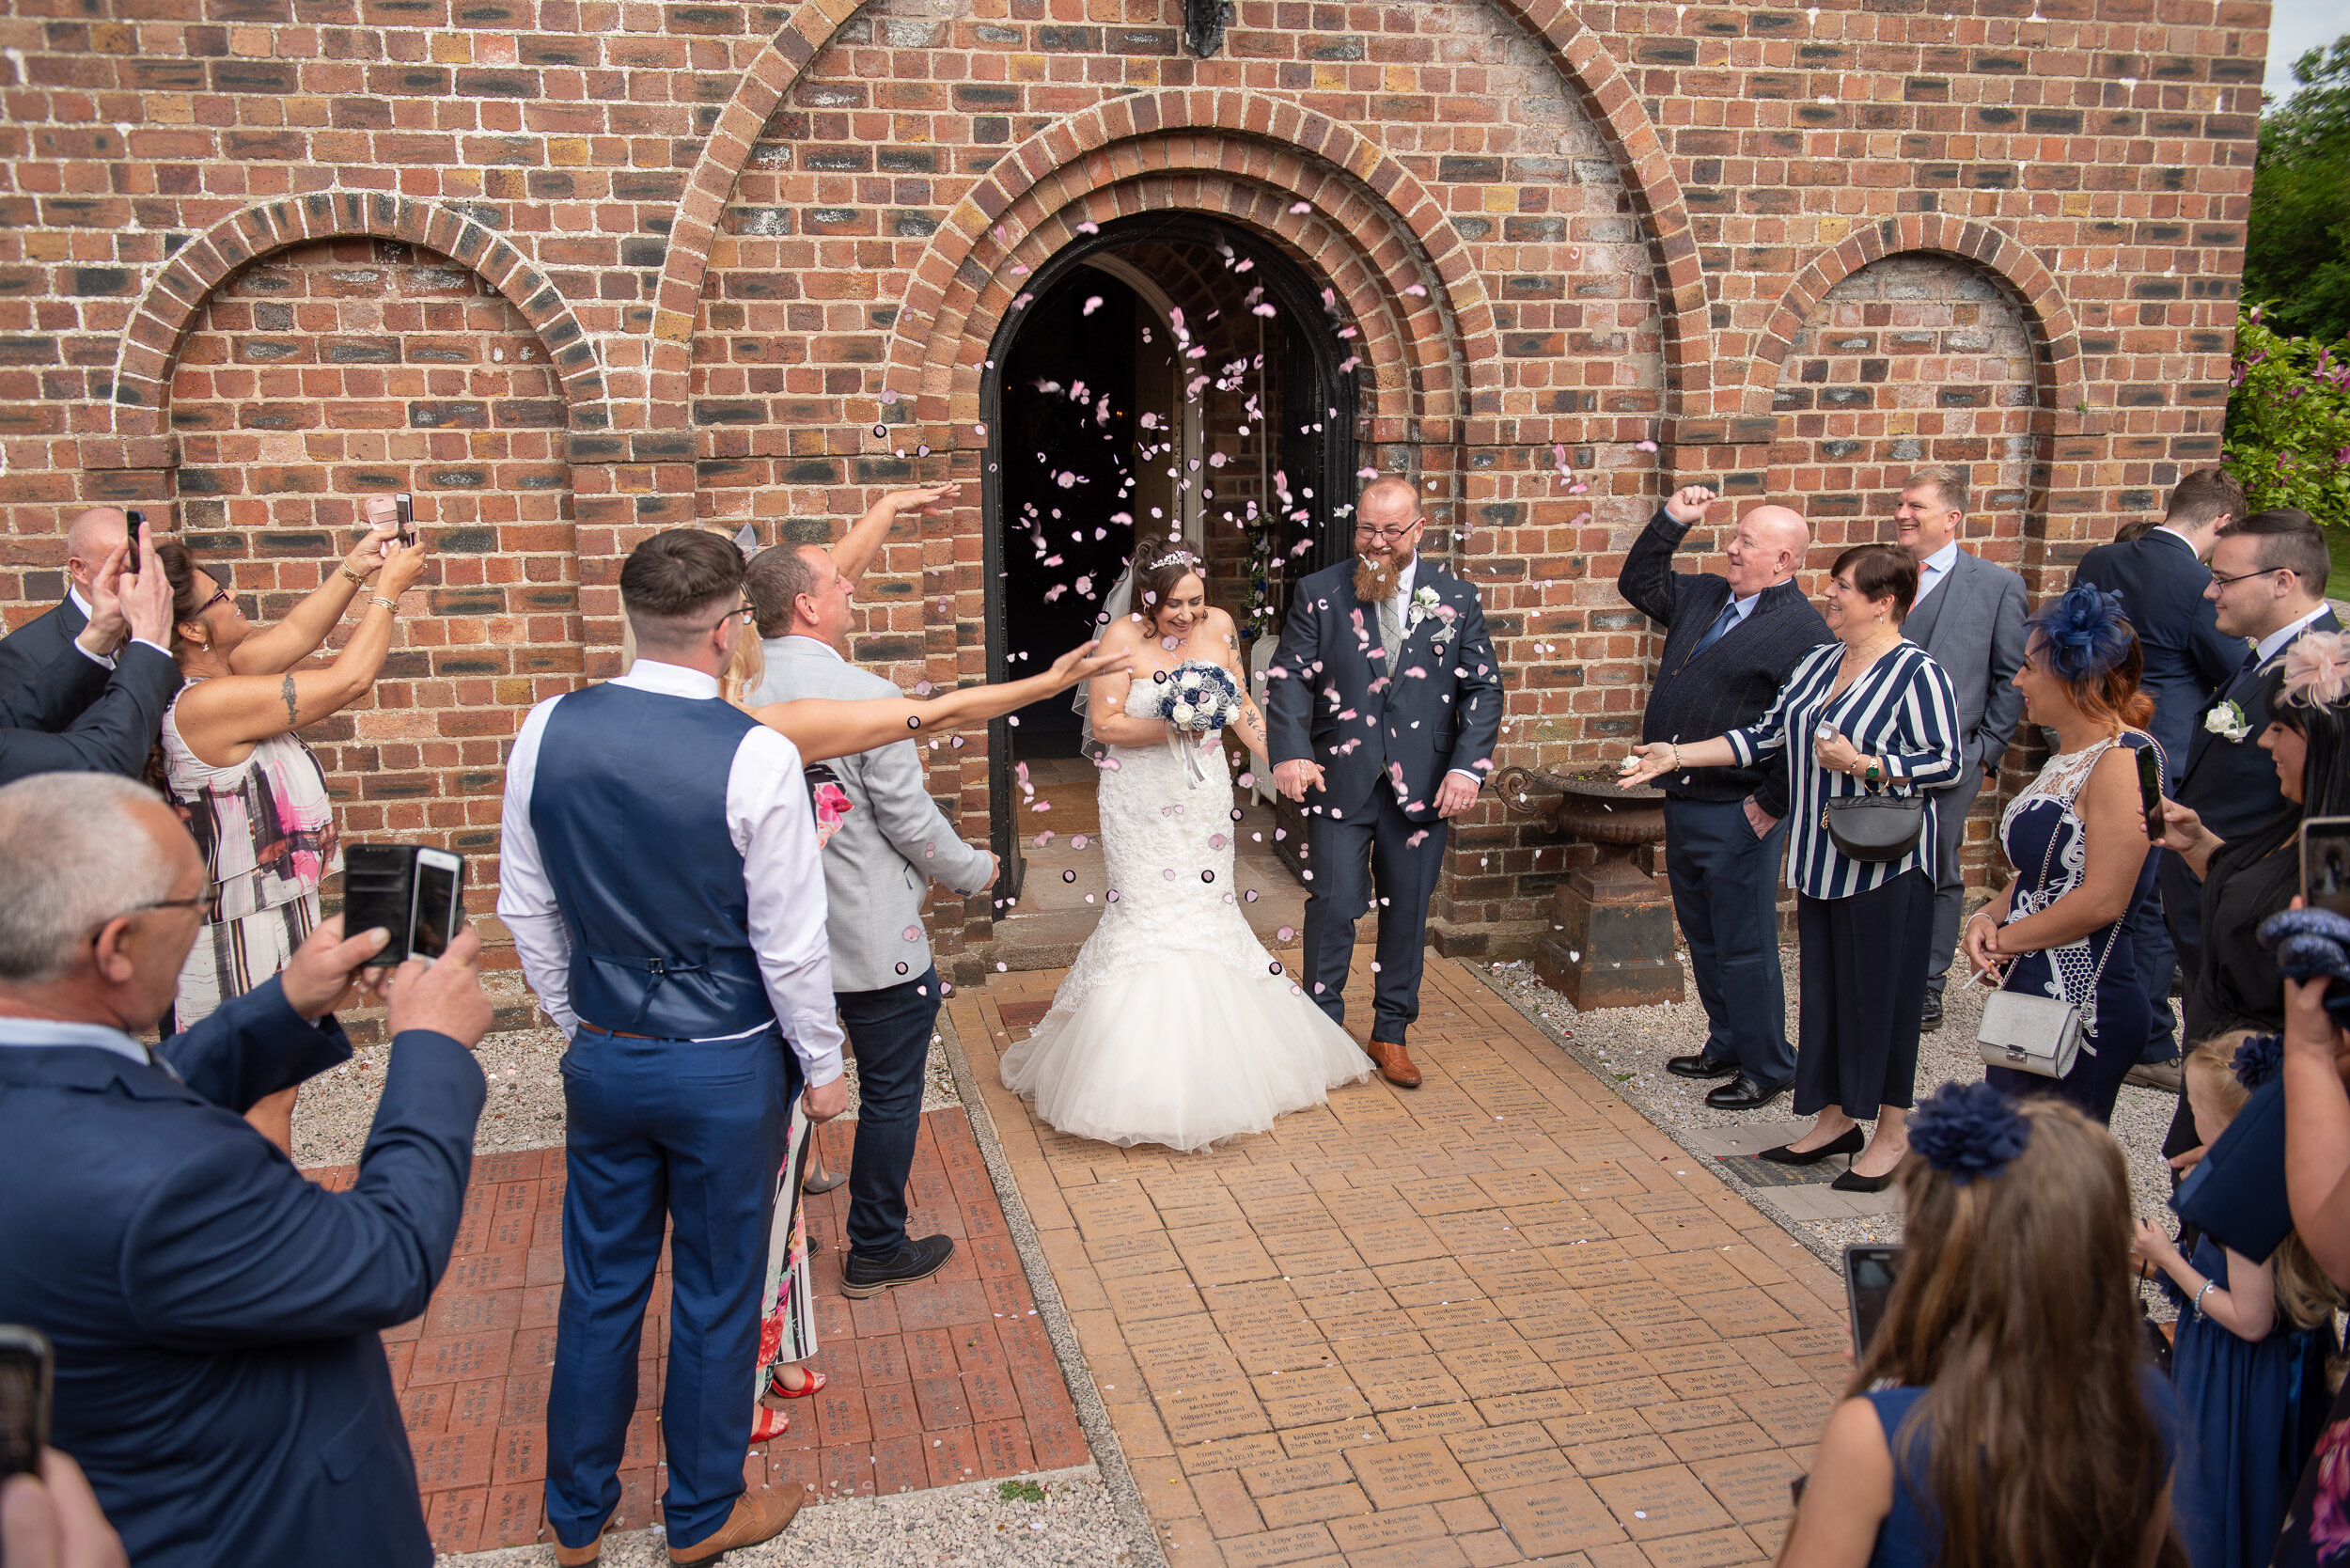 Heaton_wedding_photos_Gretna-7.jpg